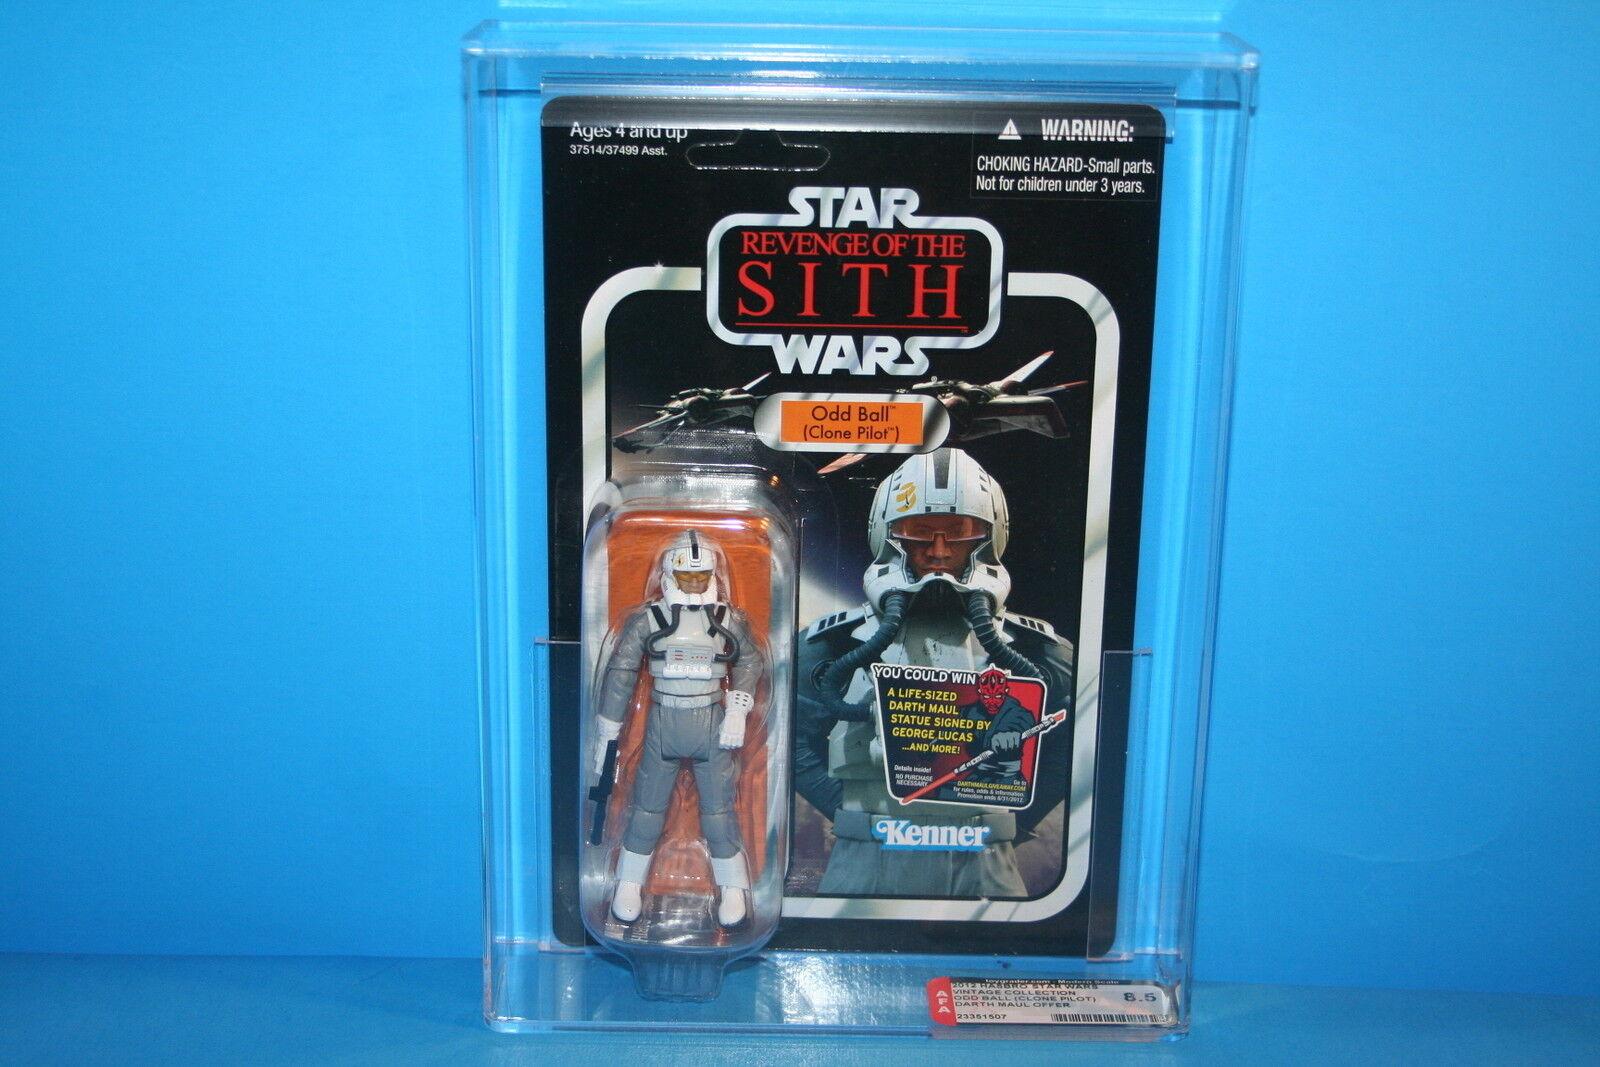 Figura De Estrella Wars autoridad clasificados 2012 Tvc menta en tarjeta figura raro bola piloto  97 HASBRO 8.5